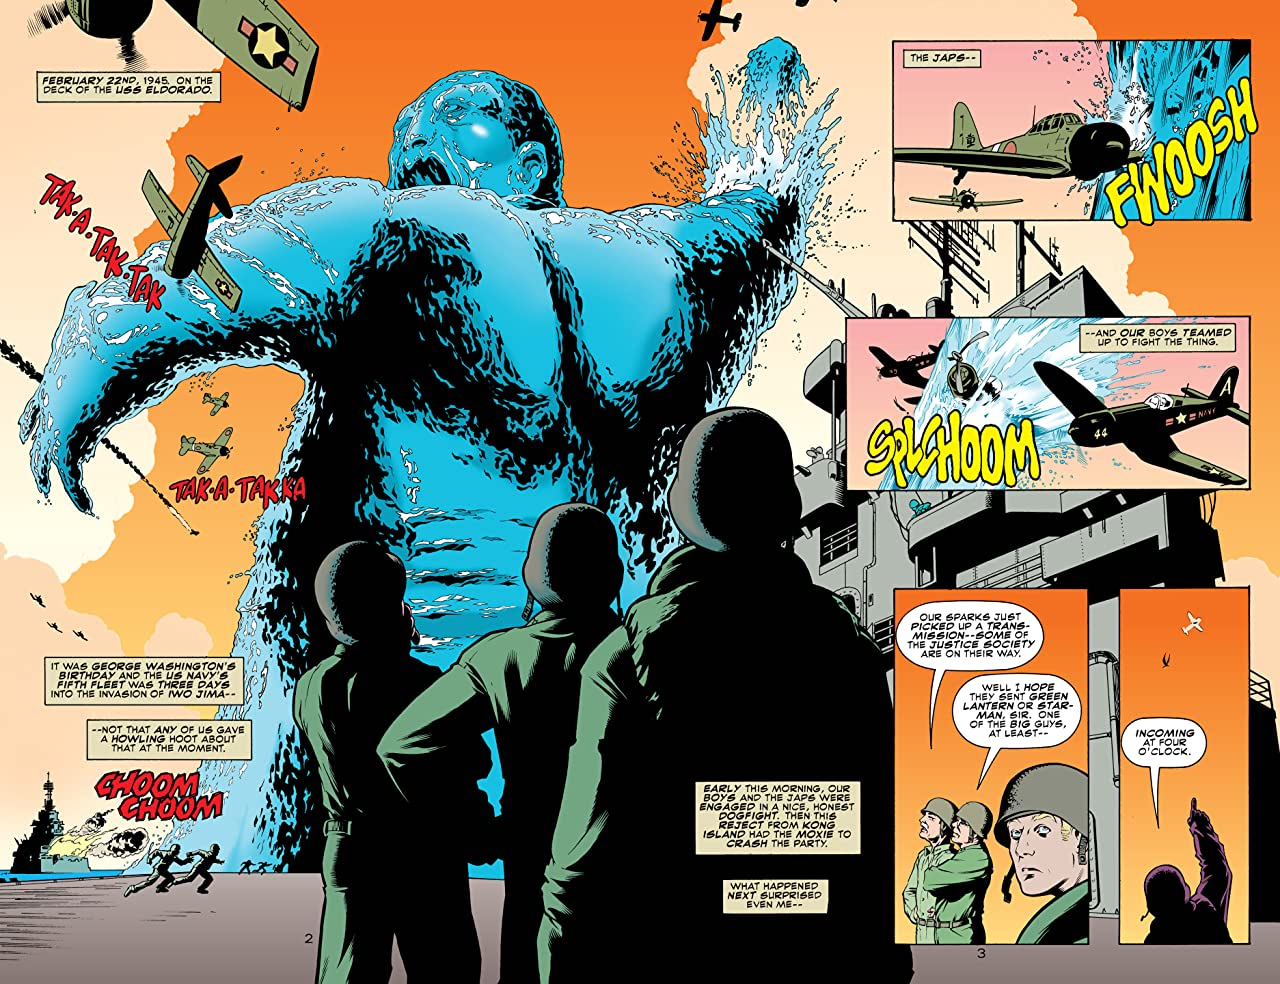 Sensation Comics (1999) #1